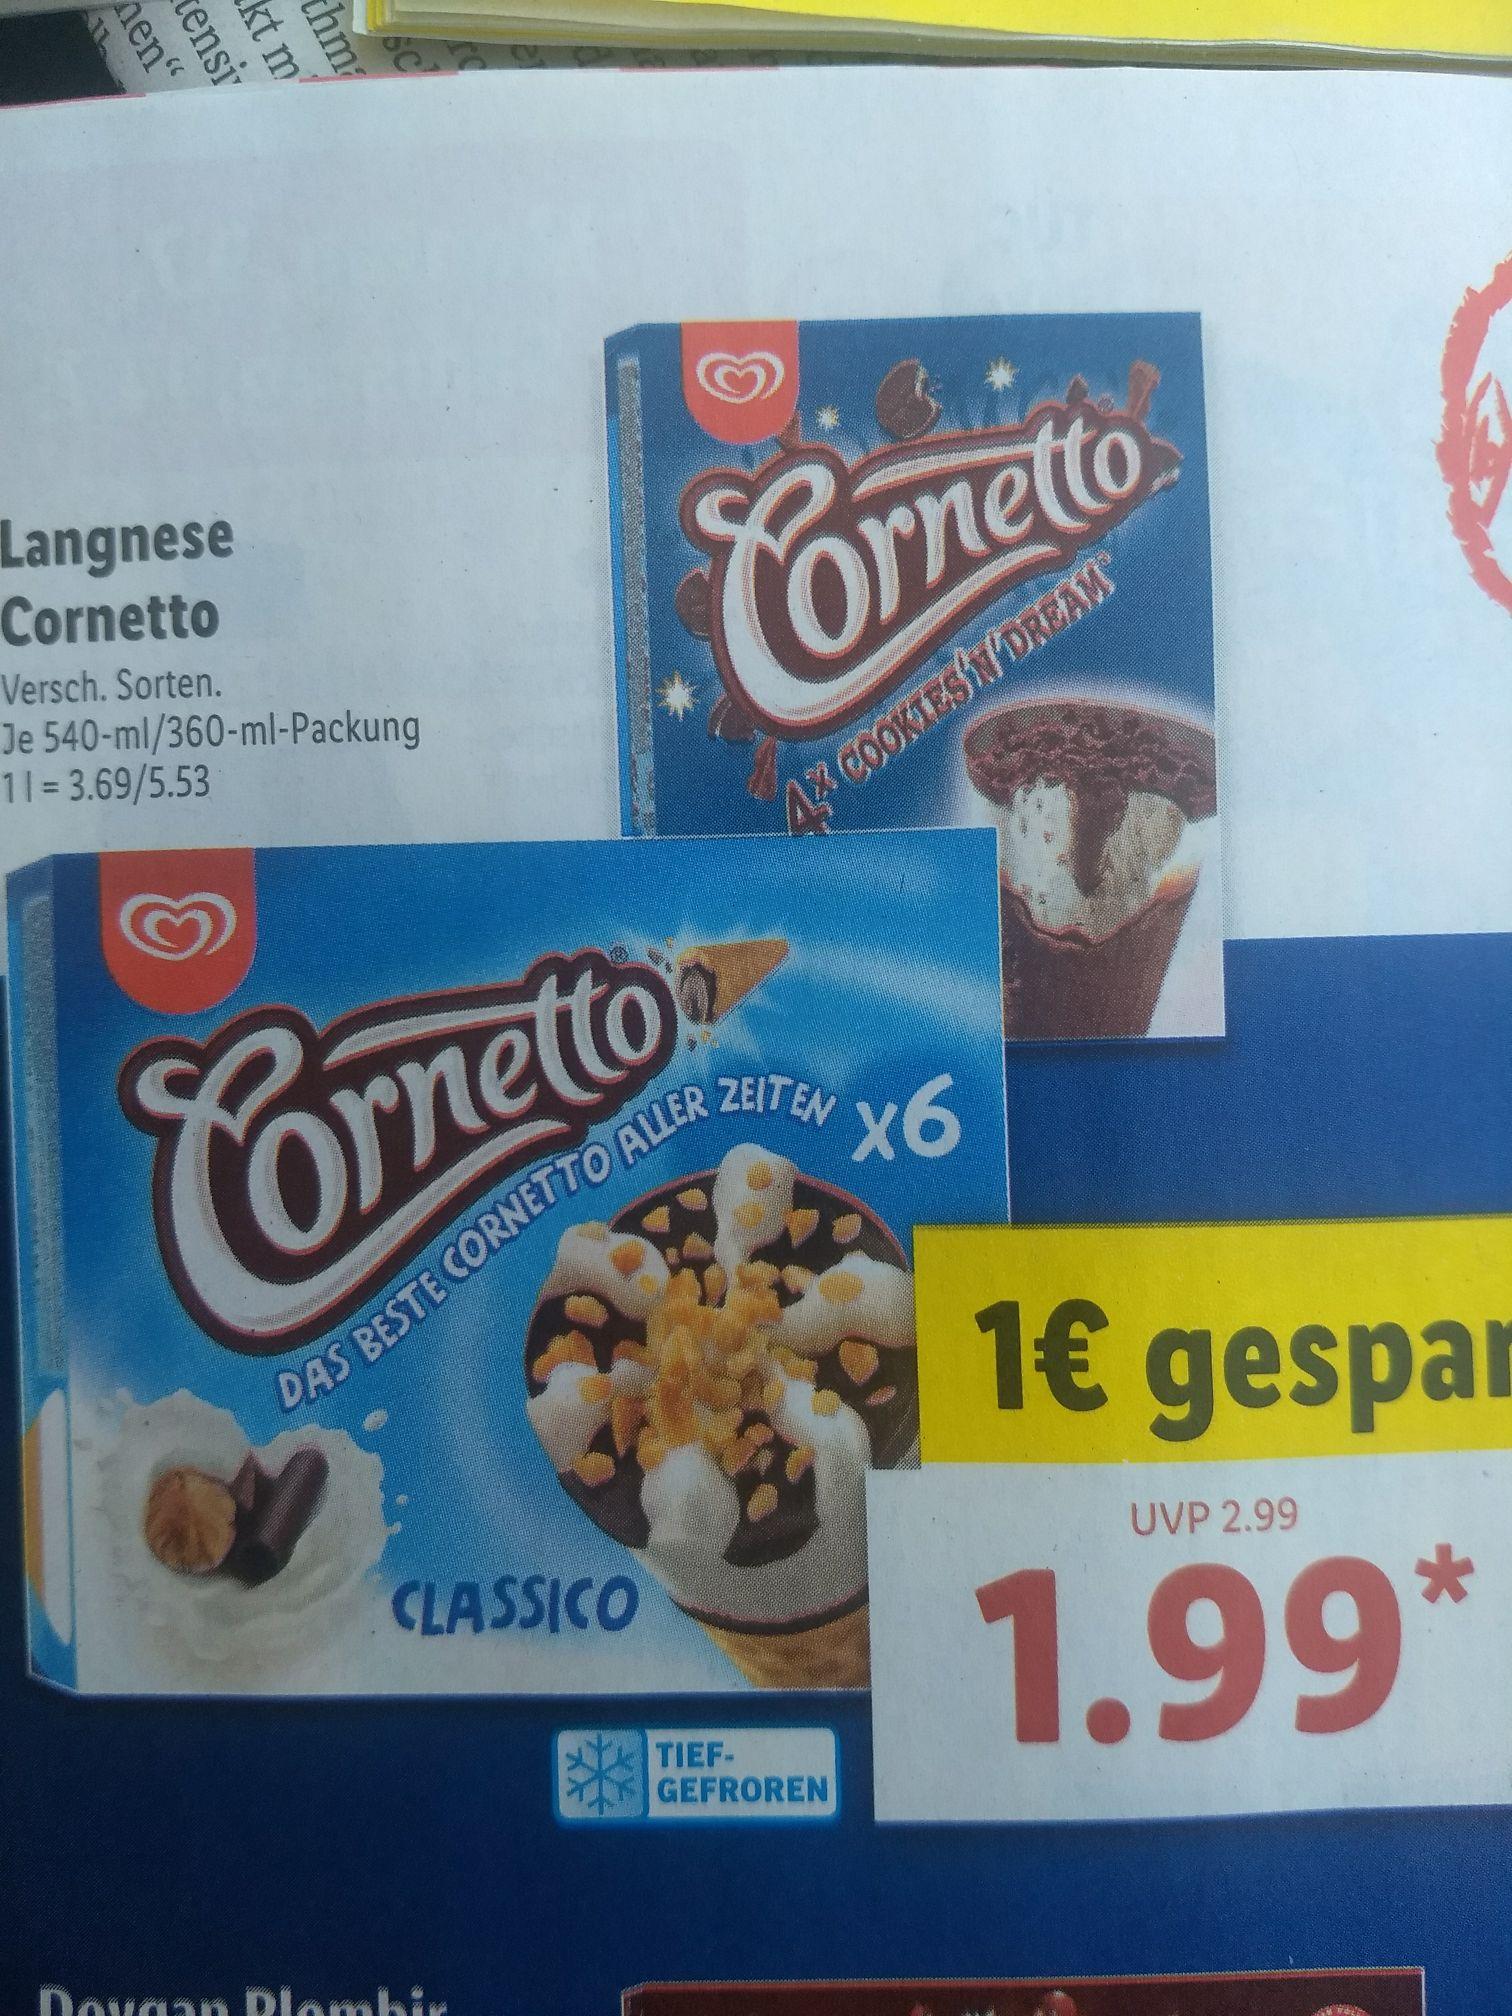 Lidl hat Langnese Cornetto Classic & Cookies Multipack für 1,99€ im Angebot